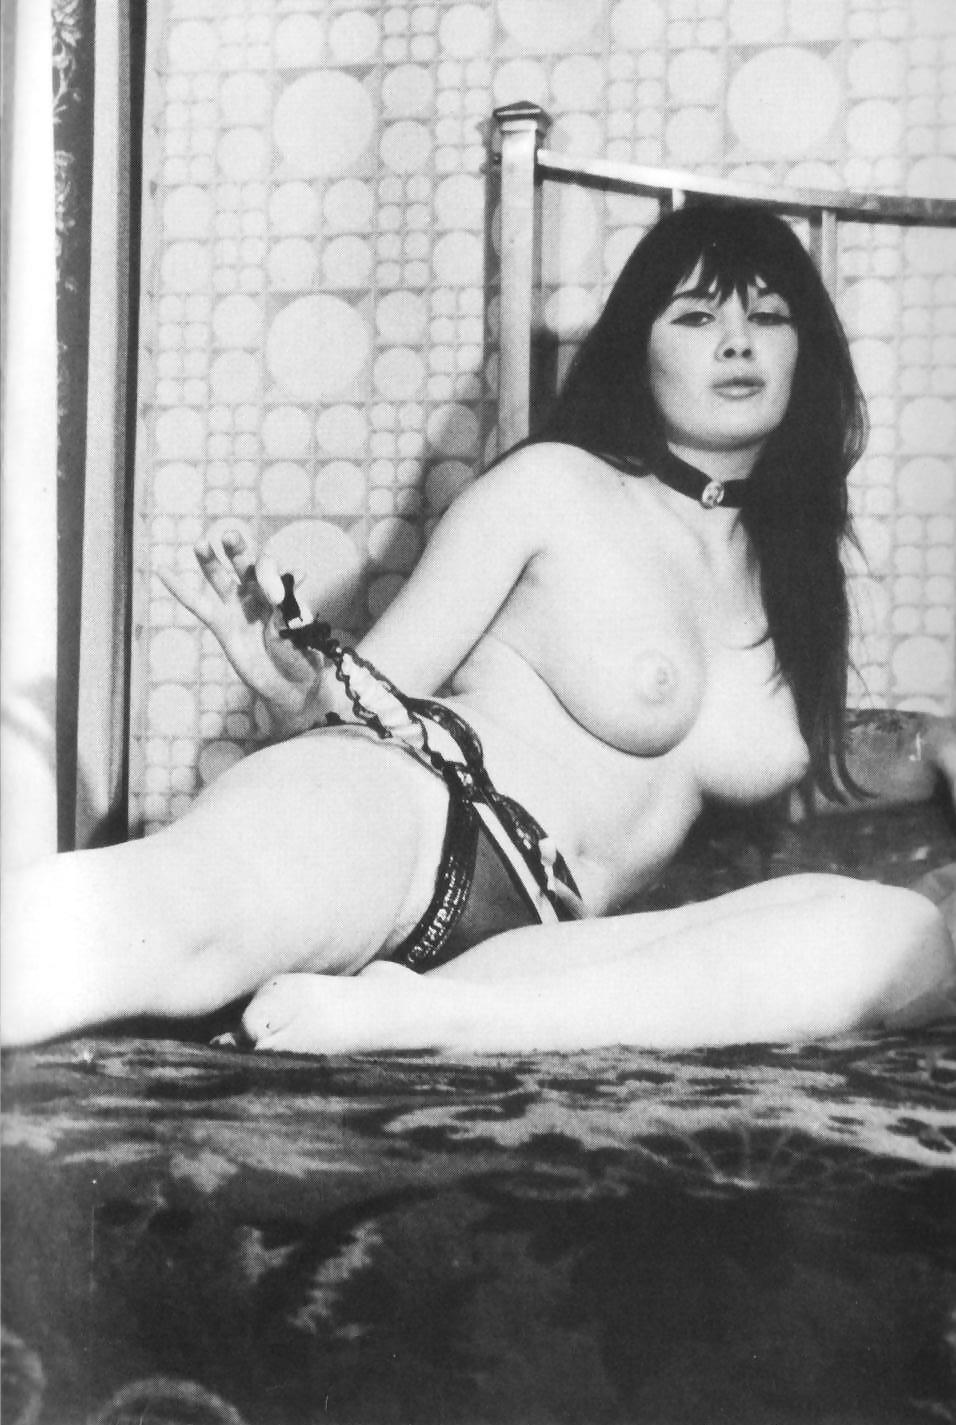 vintazh-porno-zaklyuchenniy-porno-filmi-s-karen-fisher